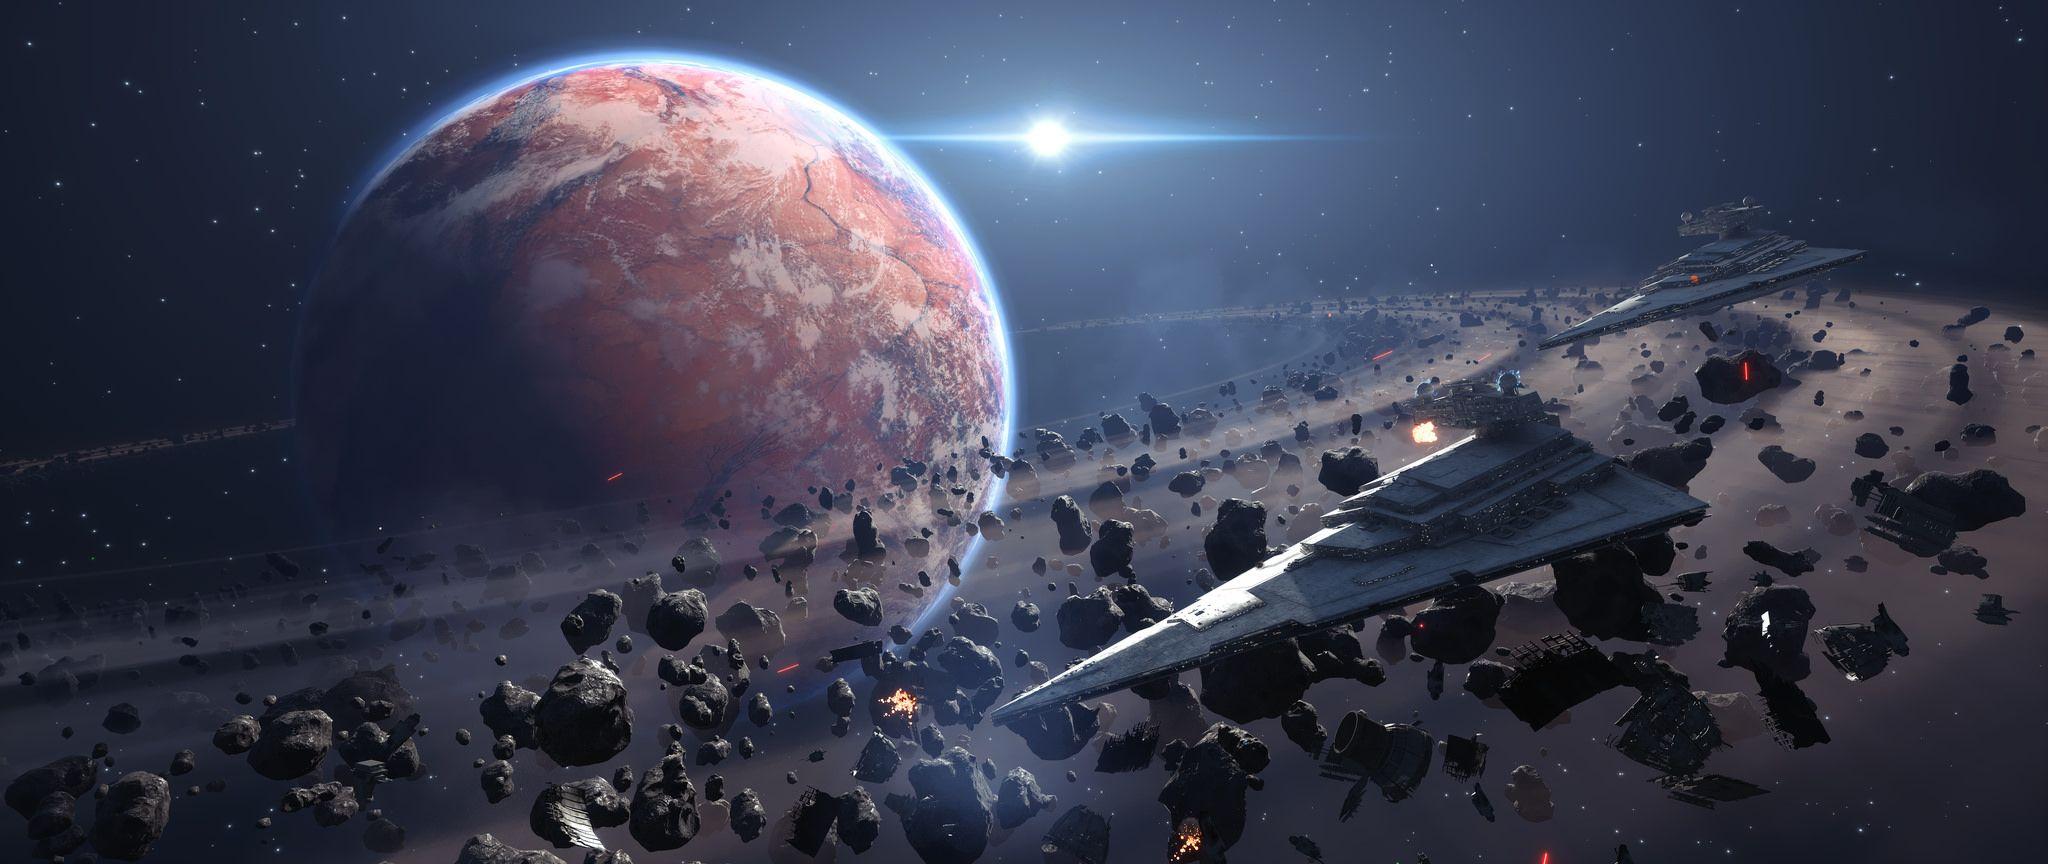 Guardians Of The Galaxy Star Destroyer Wallpaper Star Wars Wallpaper Planet Illustration